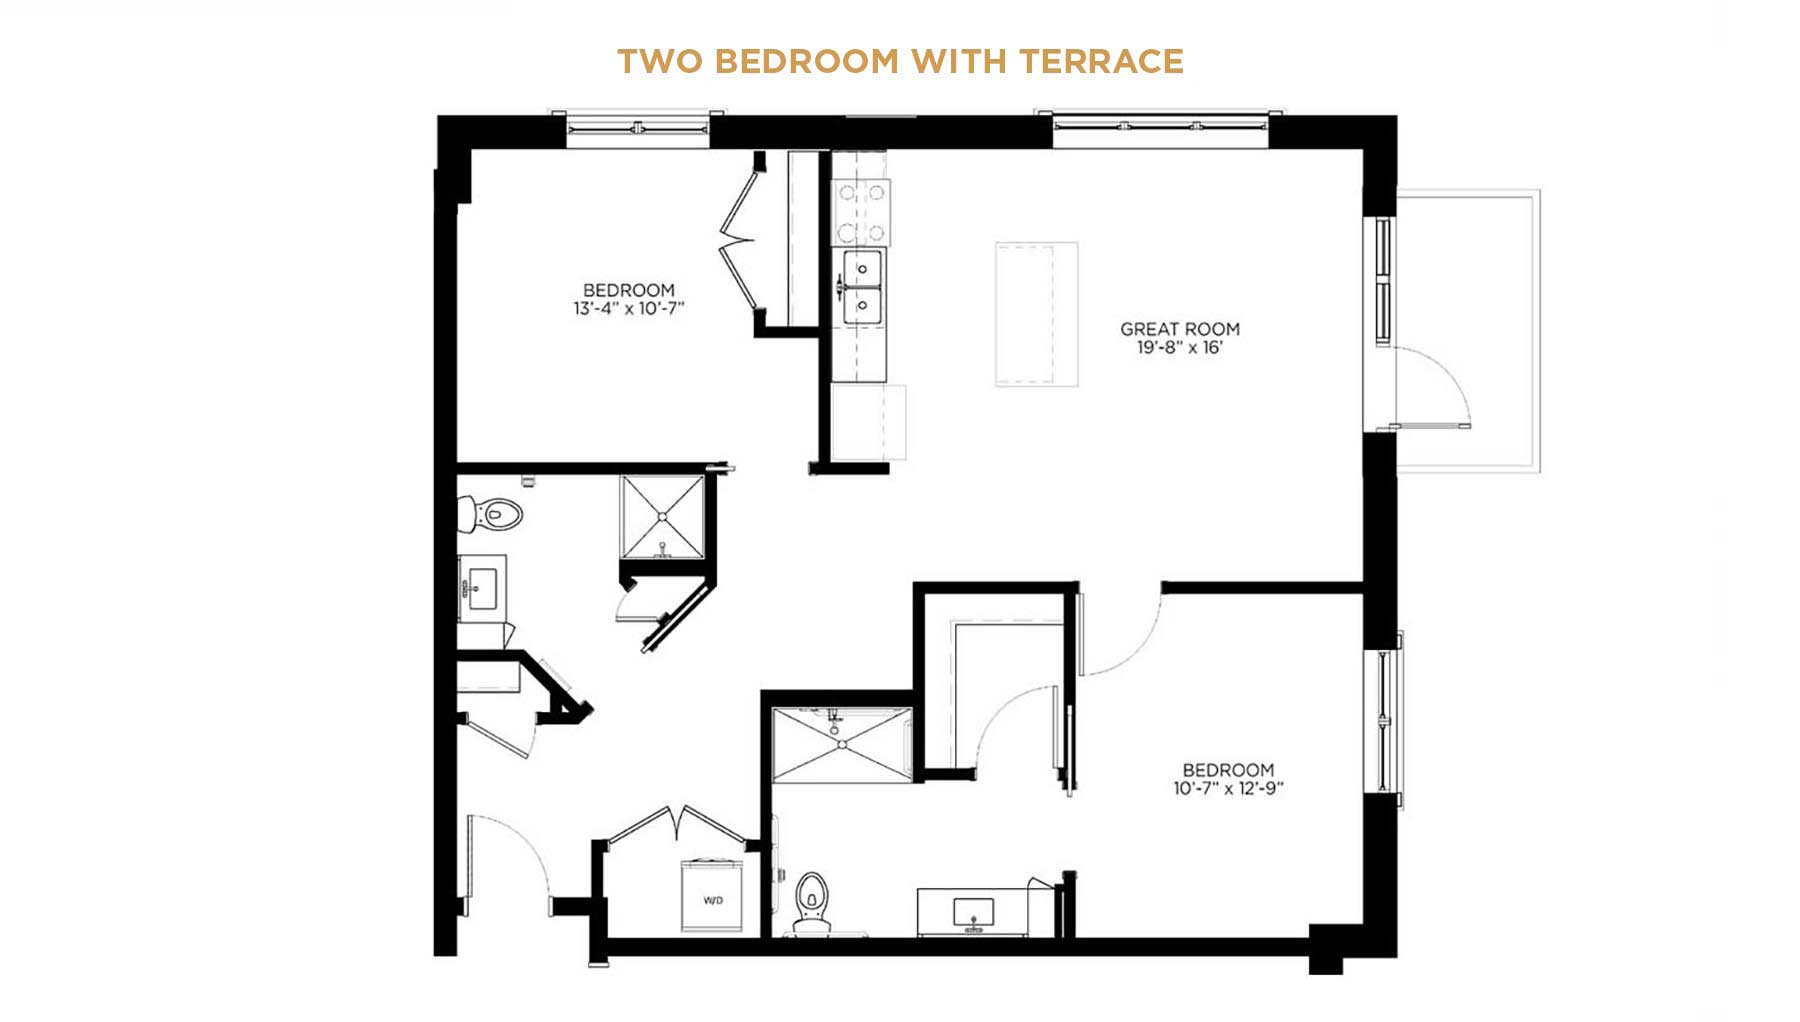 Independent living two bedroom floor plan with terrace